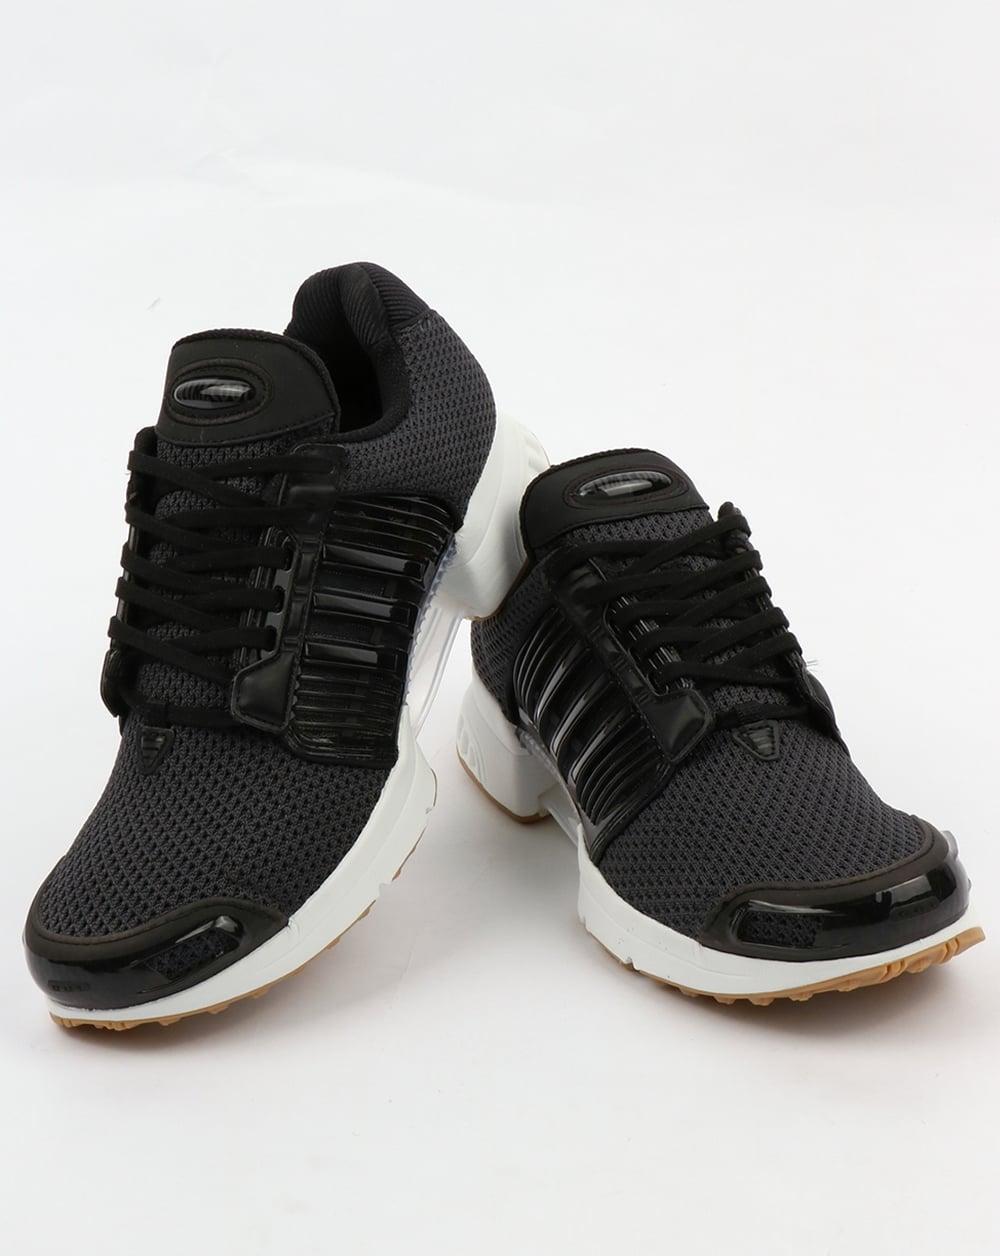 meet 2f1e7 2a2b3 Adidas Climacool 1 Trainers Copper FlatBlack